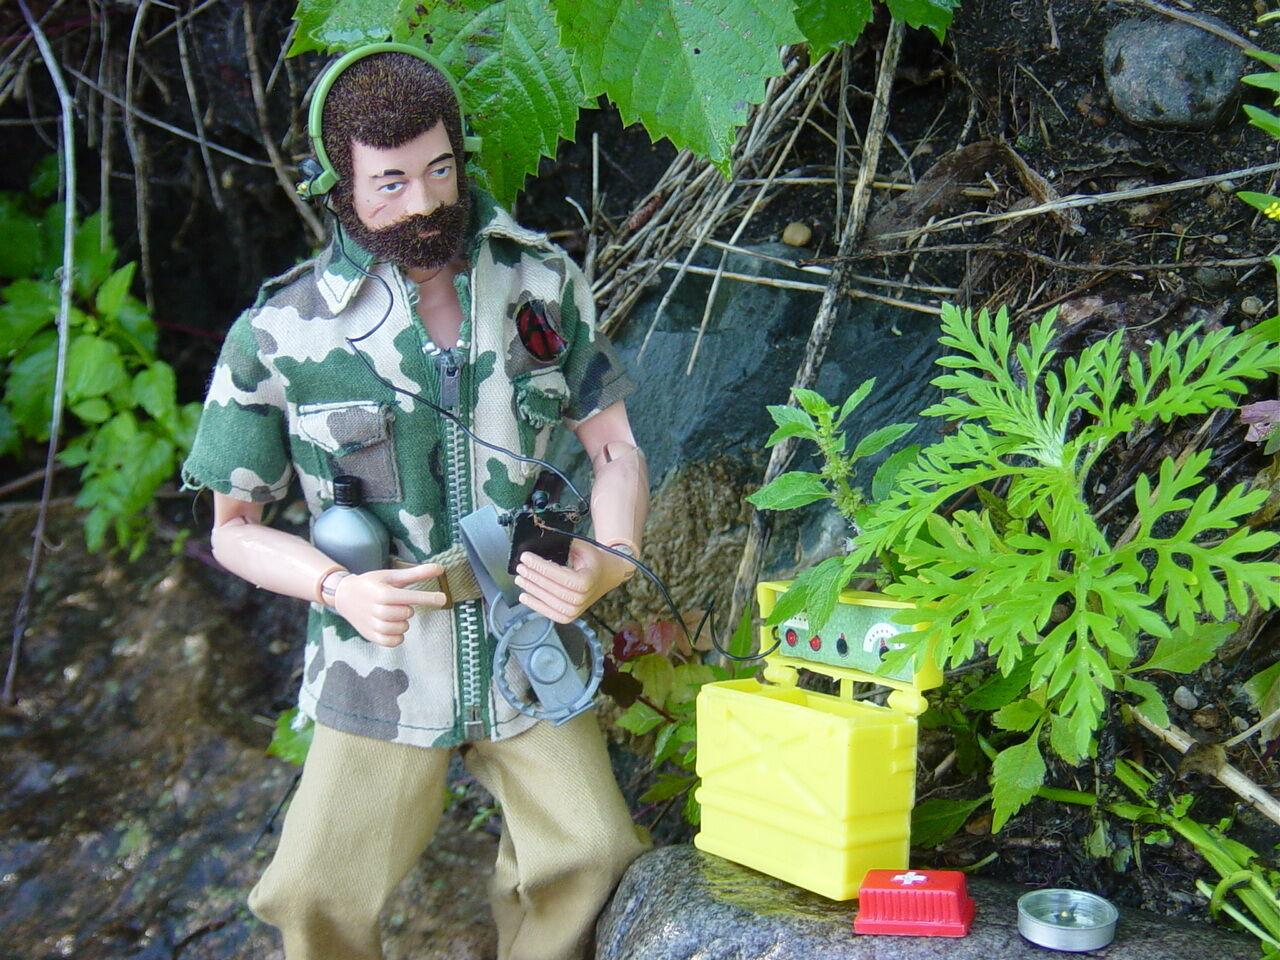 Gi Joe Vintage Jungle Survival, nice set with 1970 Land Adventurer